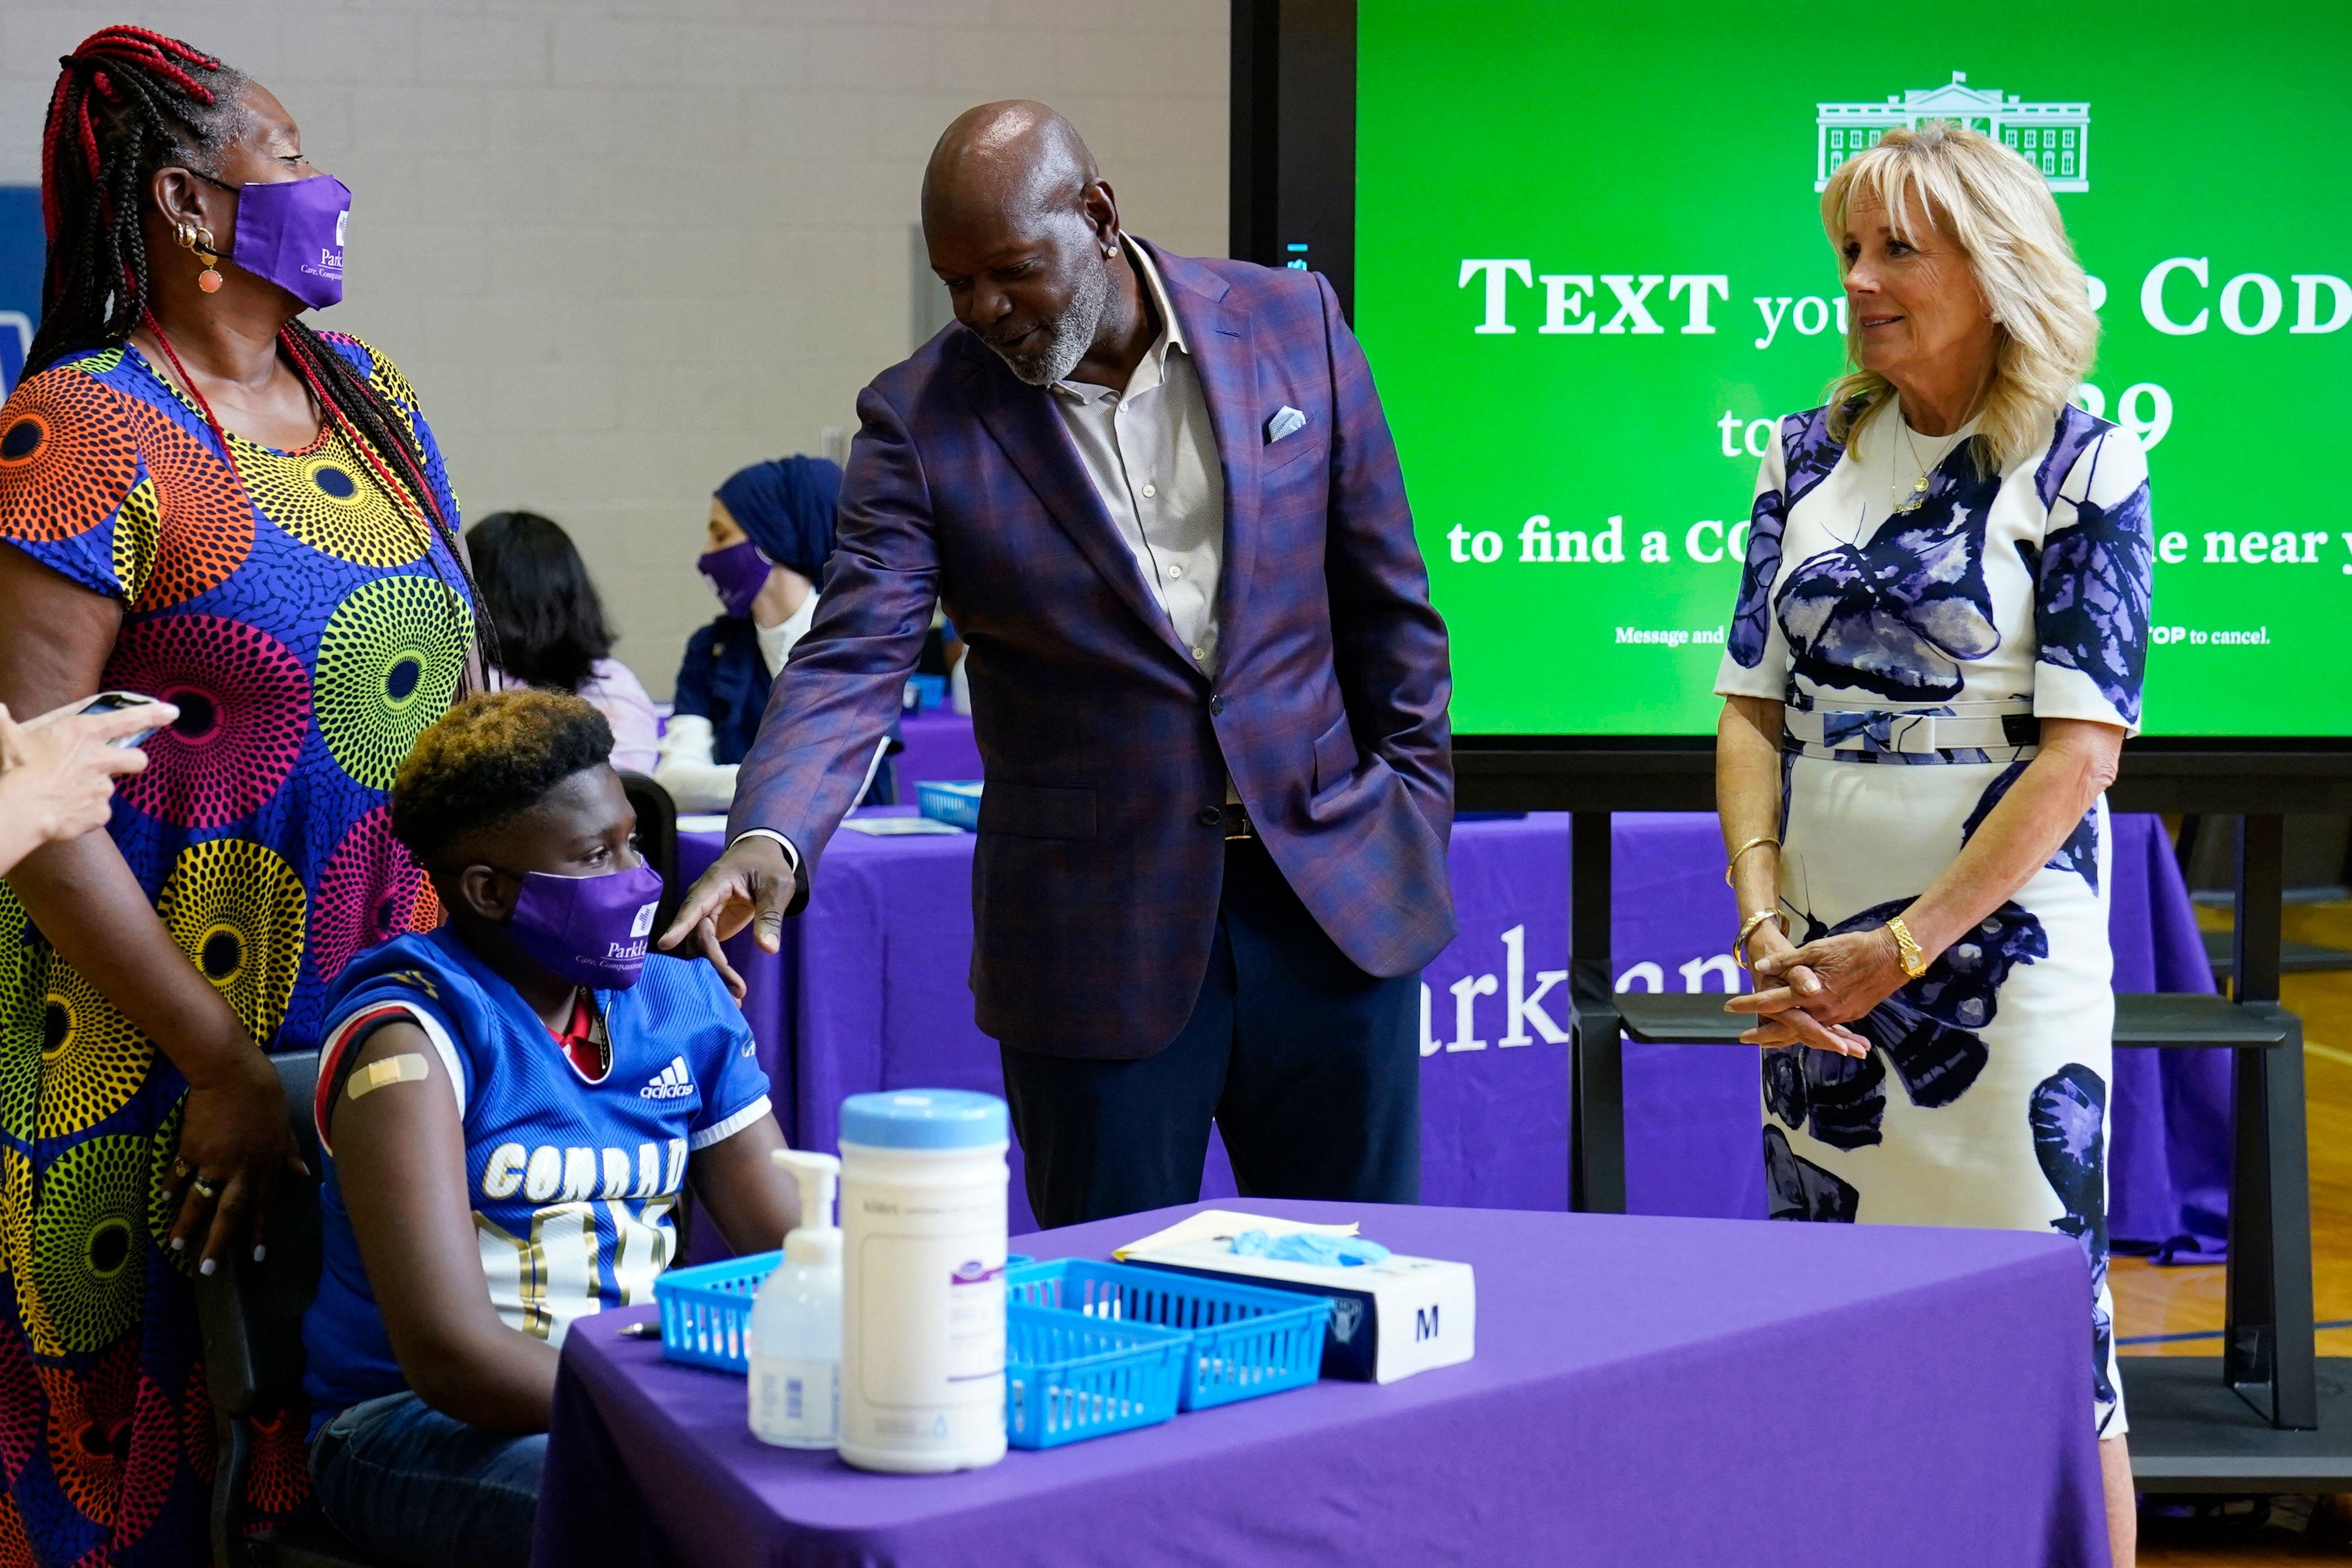 Cowboys Legend Emmitt Smith, Jill Biden Team Up to Promote COVID-19 Vaccine in Texas